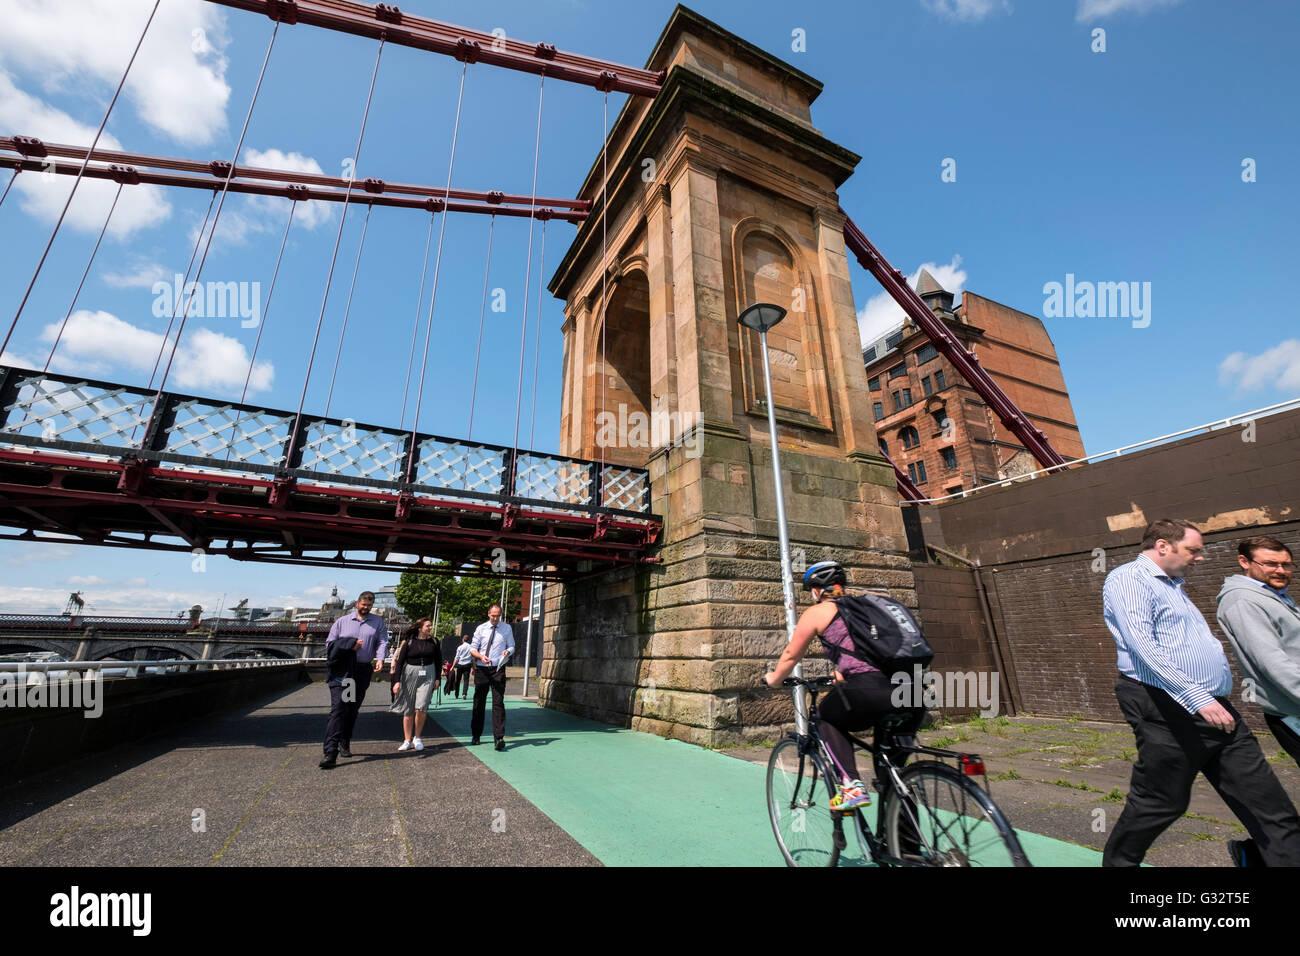 Cycleway and pedestrian walkway beneath Portland Street suspension bridge across the River Clyde in Glasgow, Scotland, - Stock Image